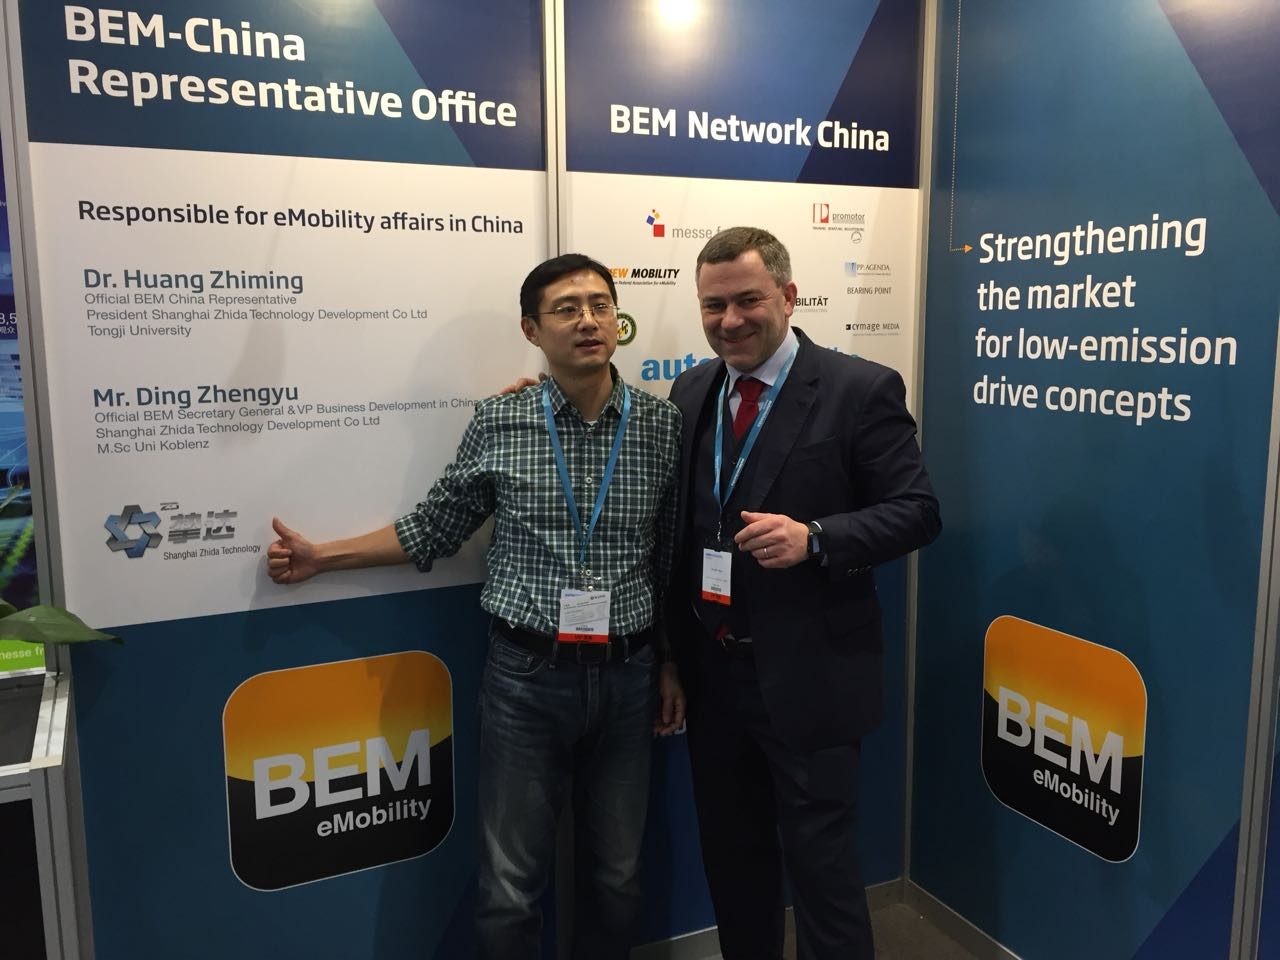 BEM-China Generalsekretär Zhengyu Ding und Vizepräsident Christian Heep